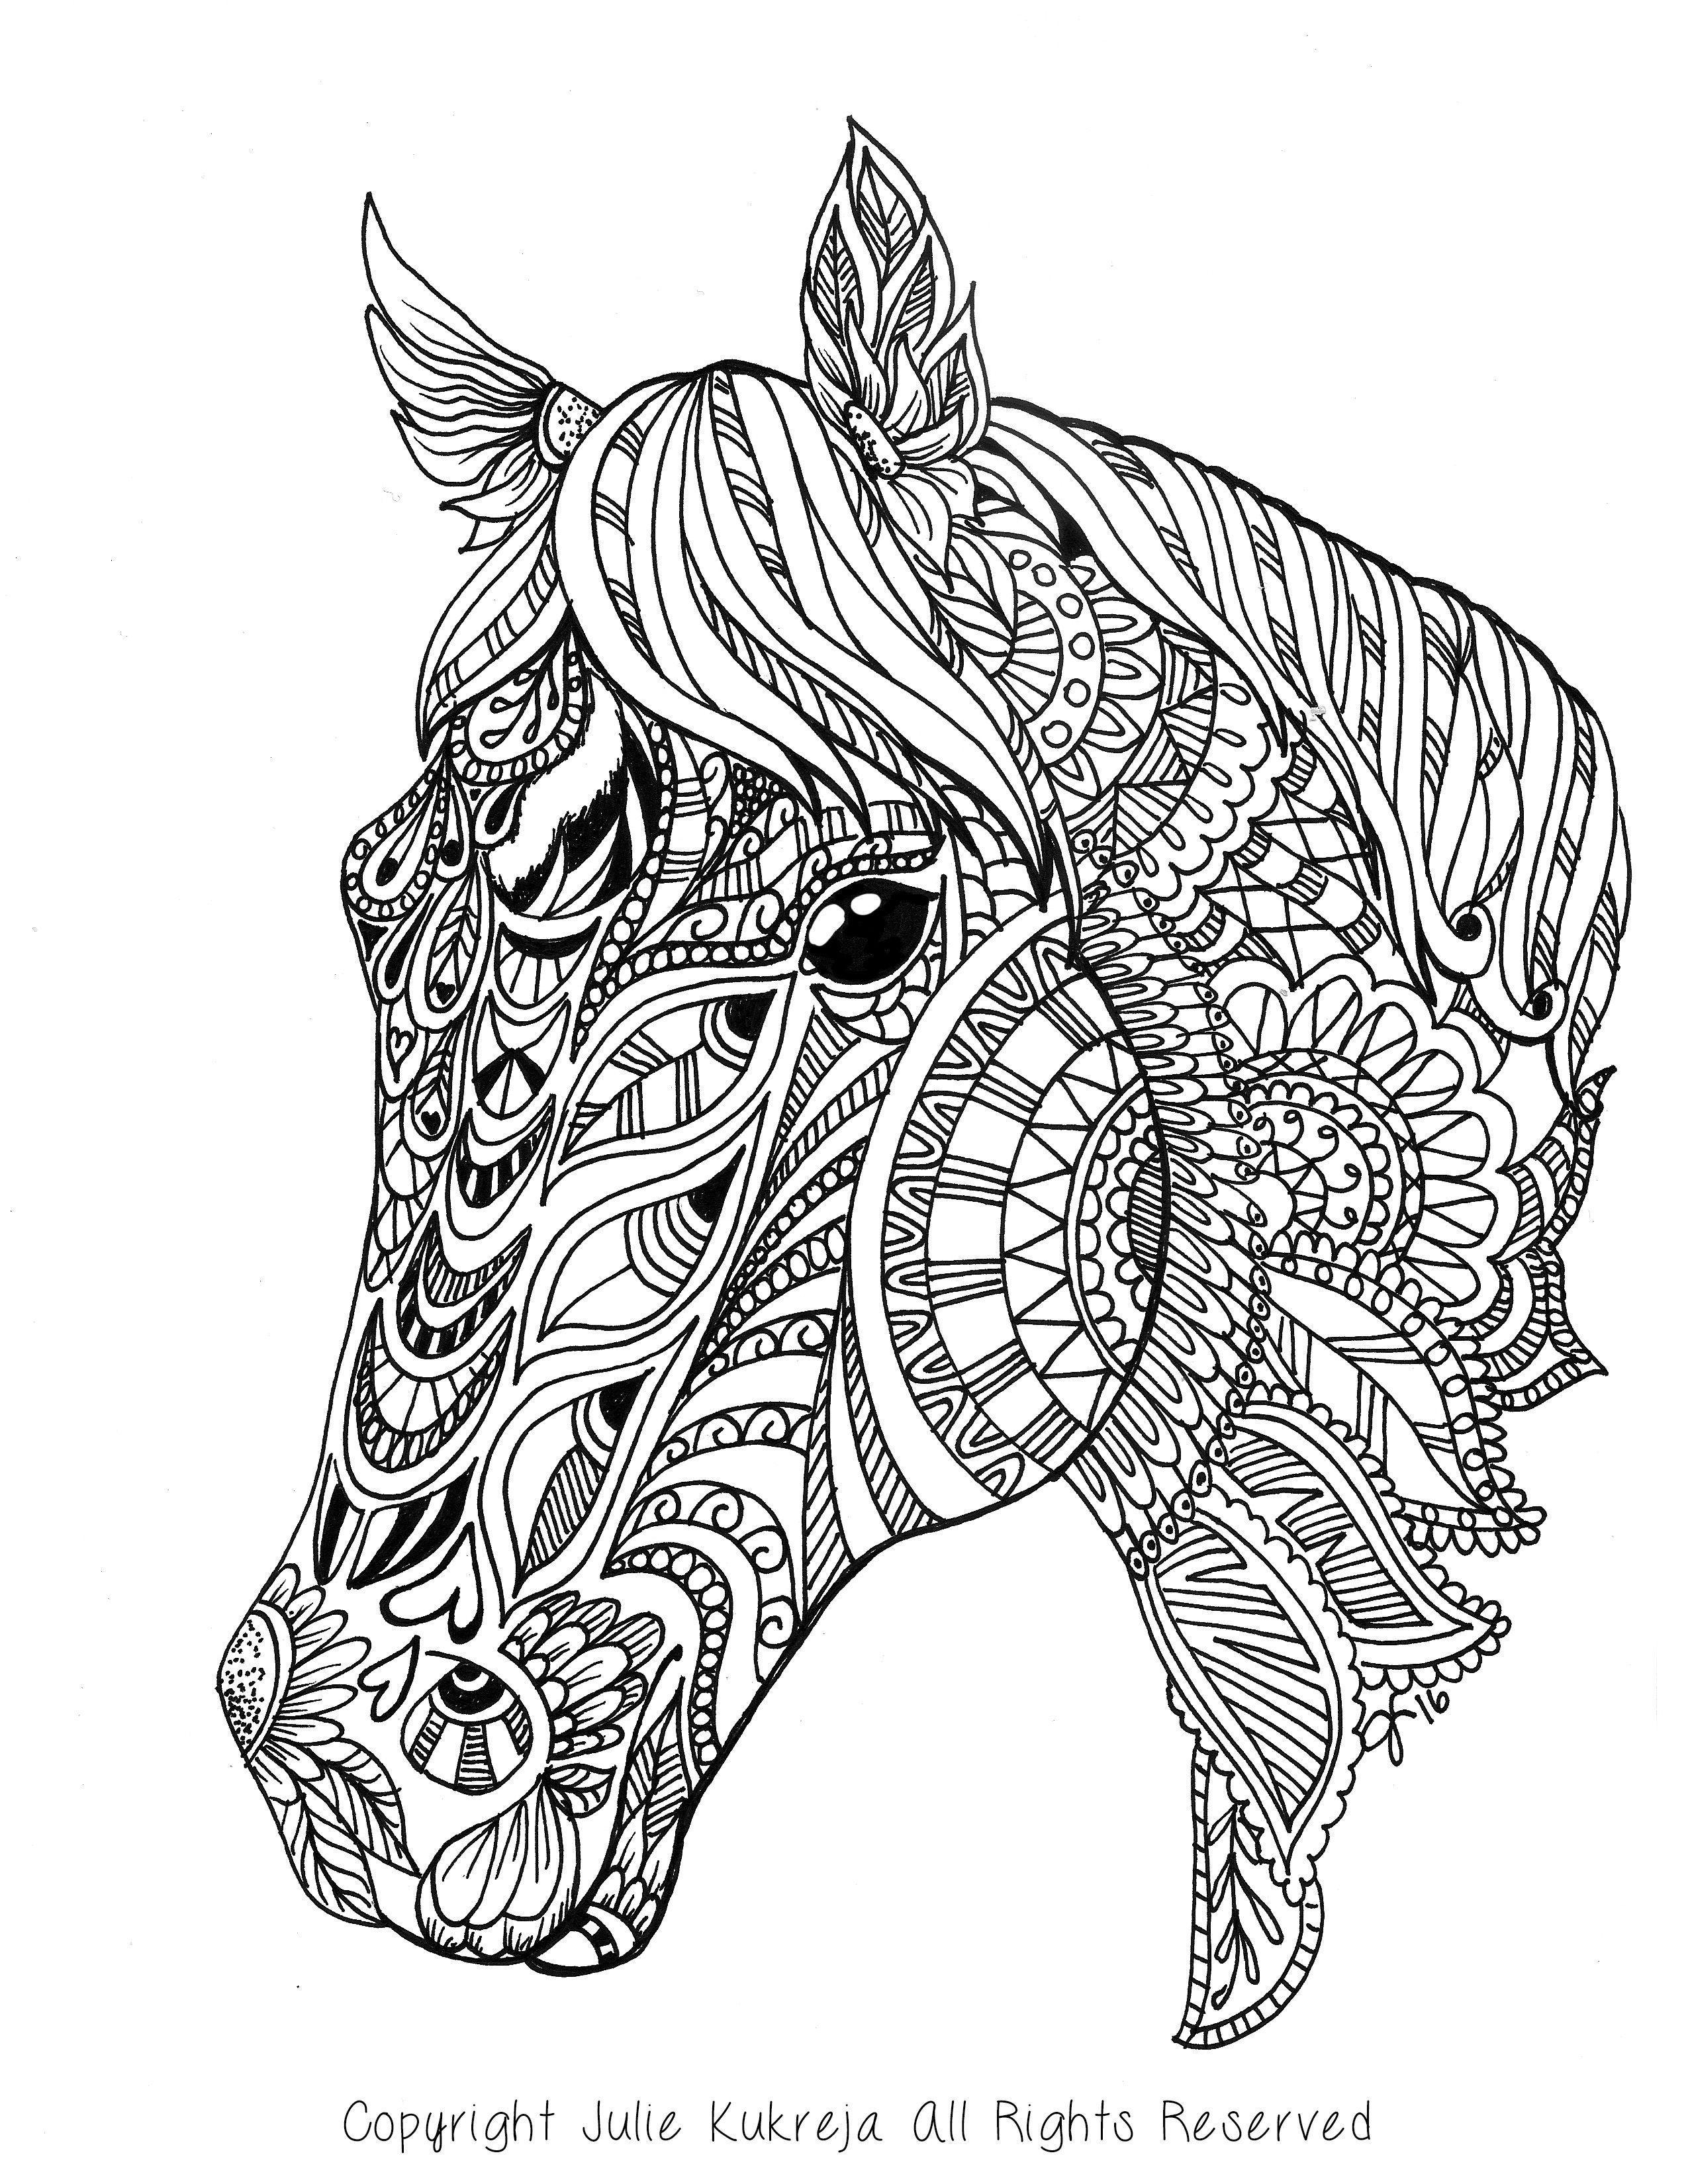 Mandala Tiere Bilder  Mandala tiere, Ausmalbilder pferde zum